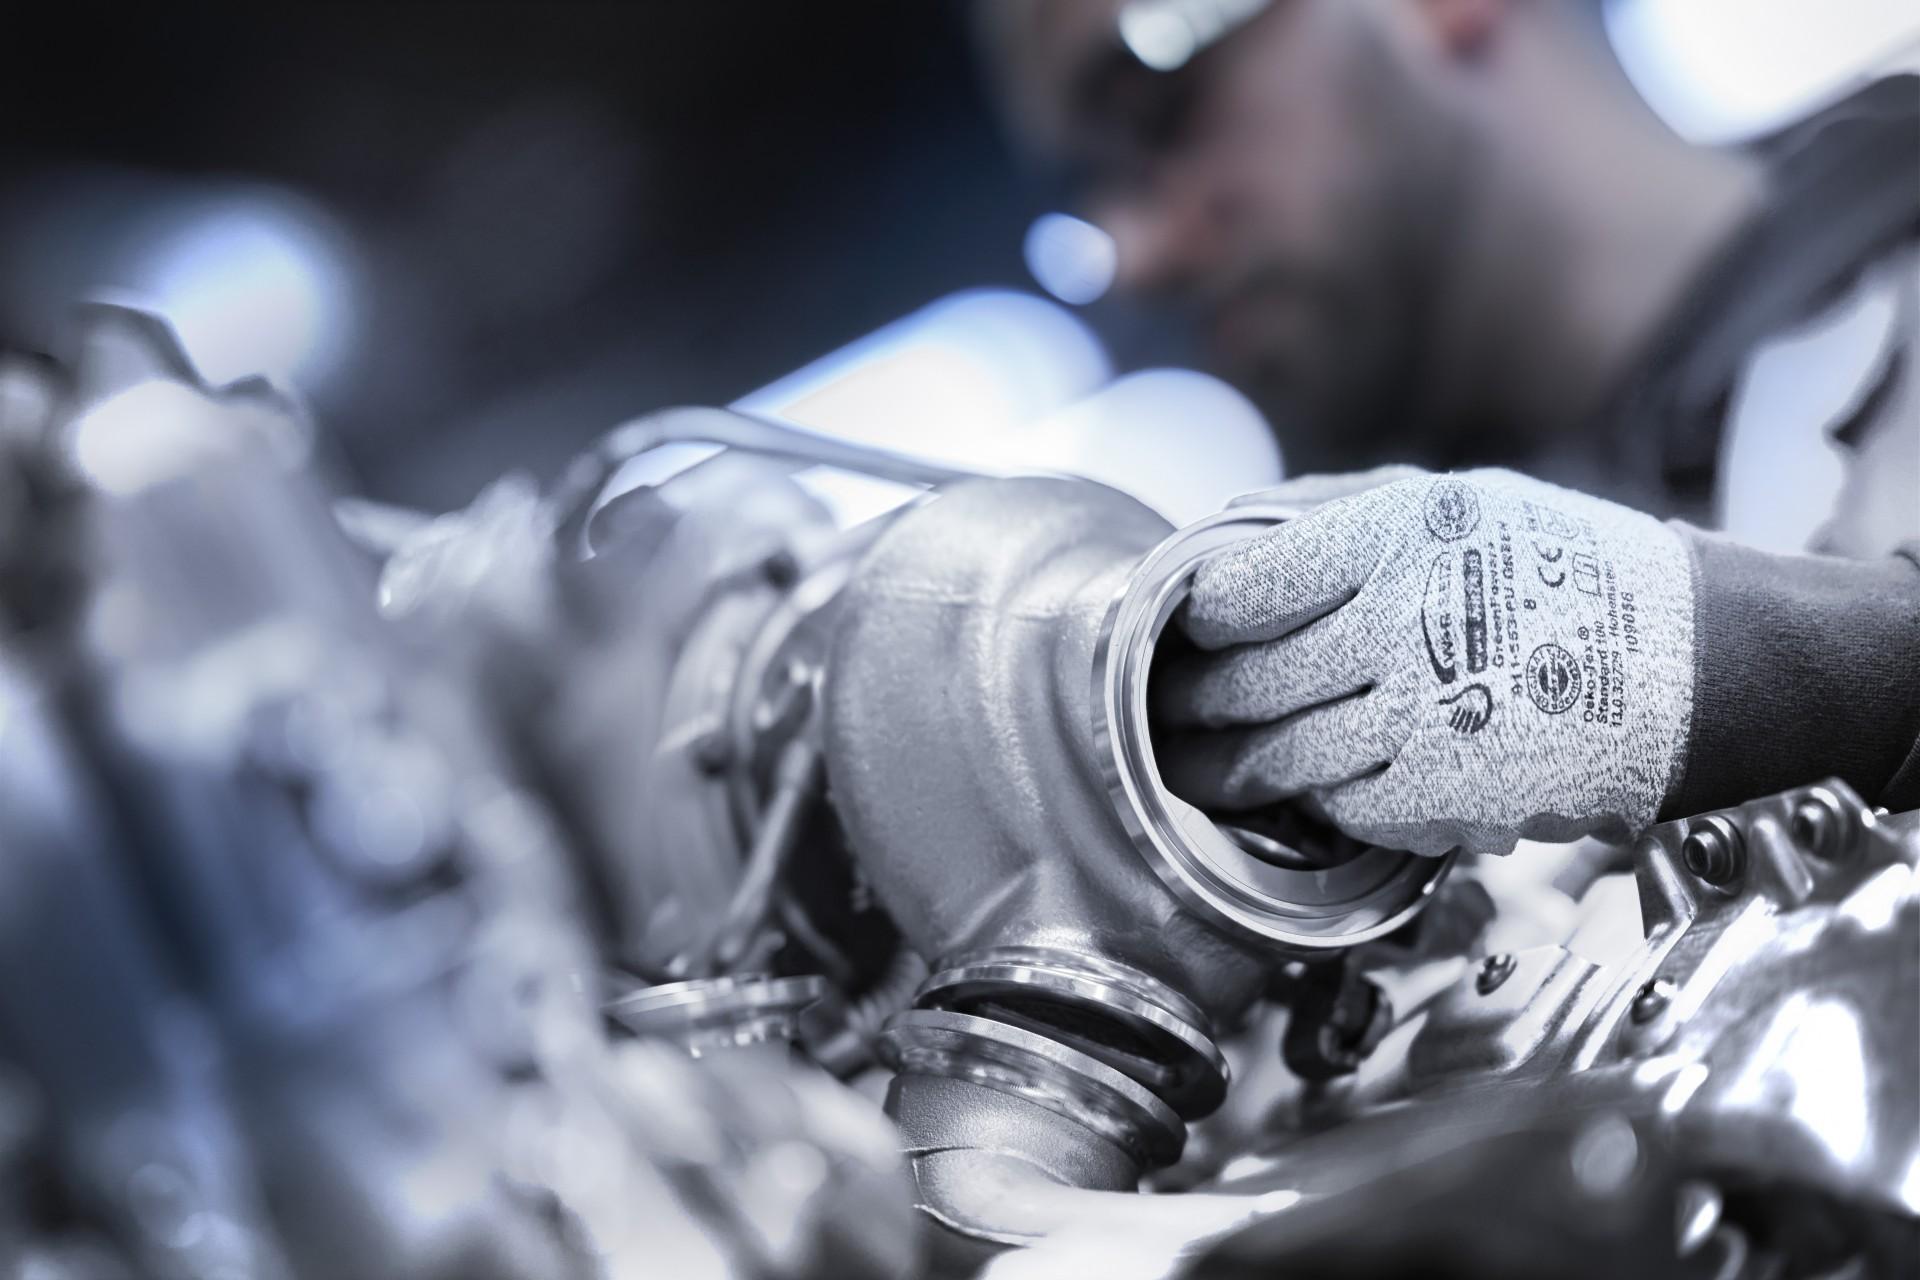 BMW V8 engine 3